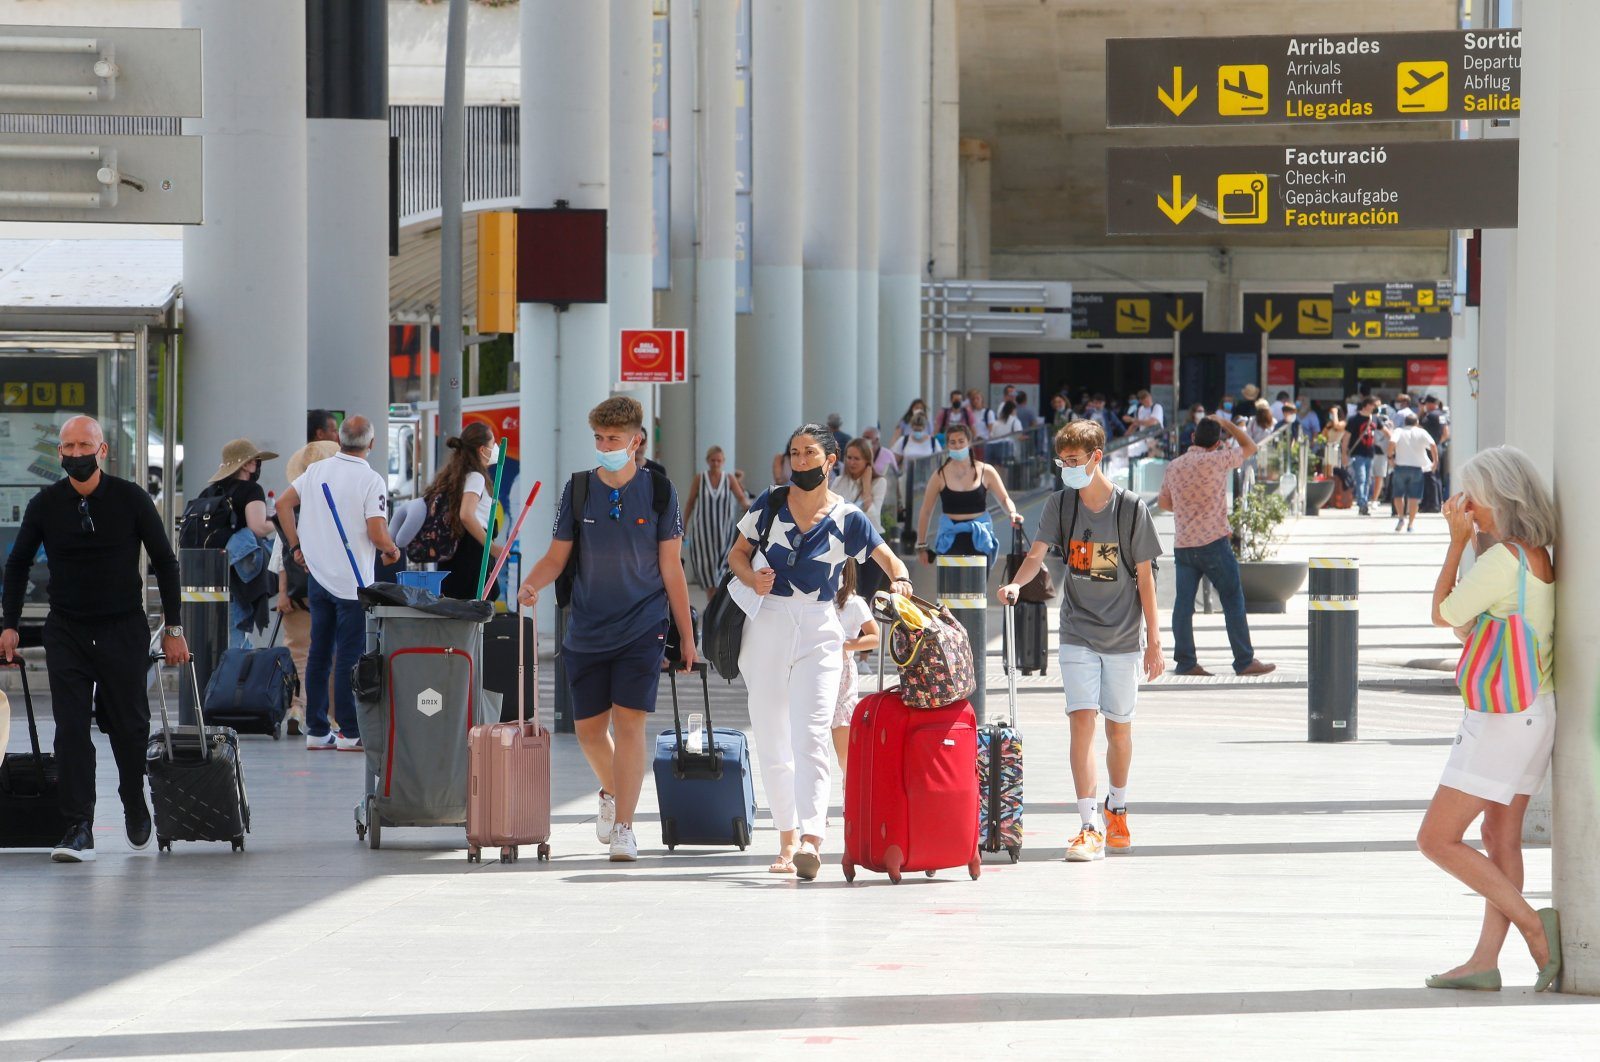 Tourists from Britain arrive at Palma de Mallorca Airport in Palma de Mallorca, Spain, June 30, 2021. (Reuters Photo)